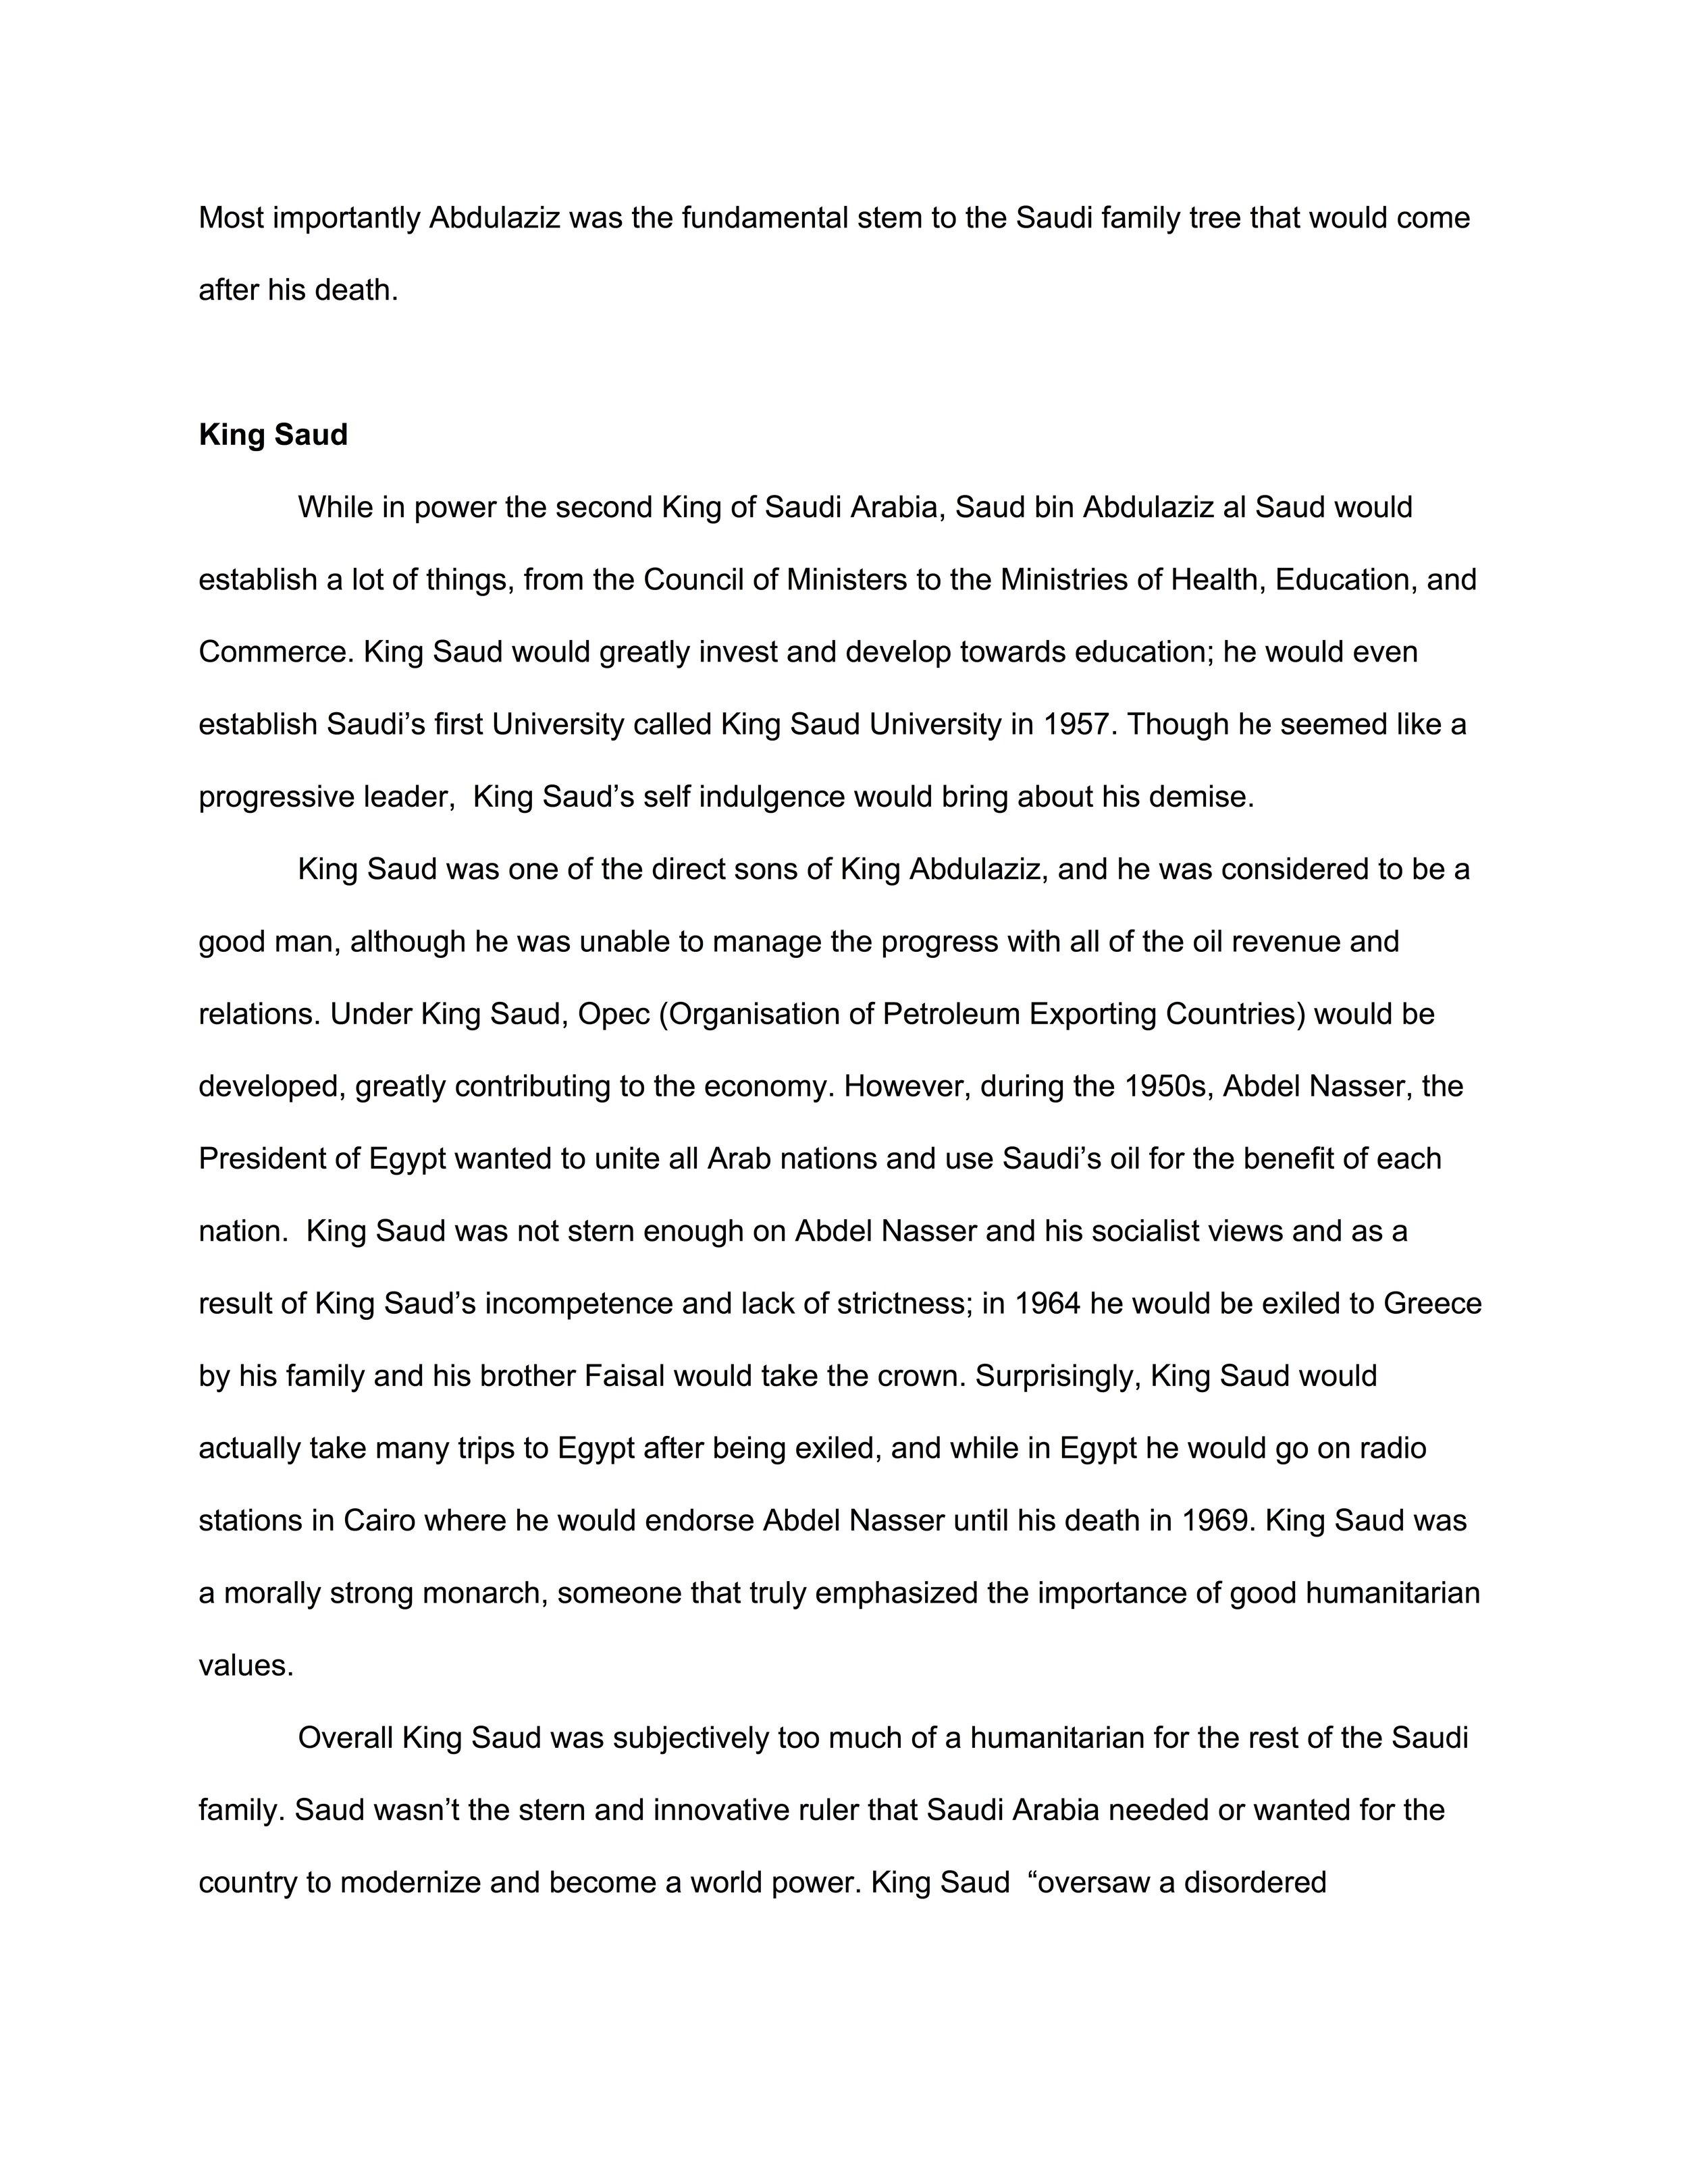 Essay on Saudi Kings, Chris Matta '19